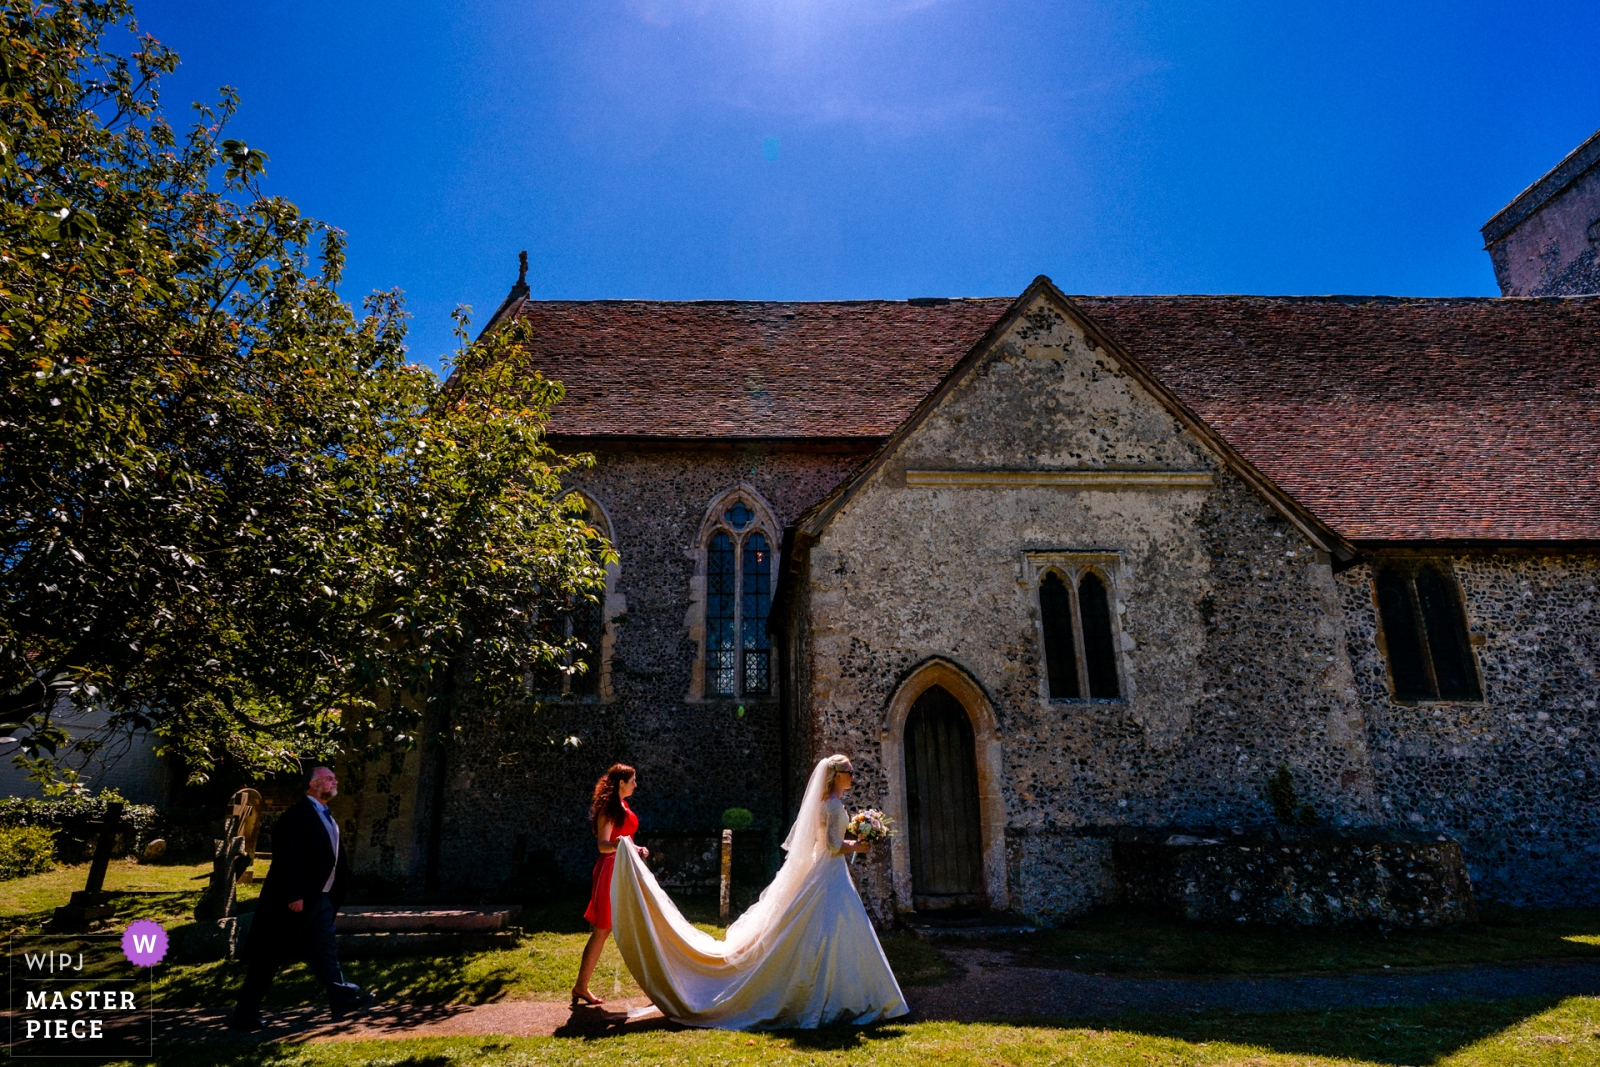 Bride arrives at church for her wedding ceremony - Hertfordshire, England Wedding Photography -  | Barham, Kent, UK